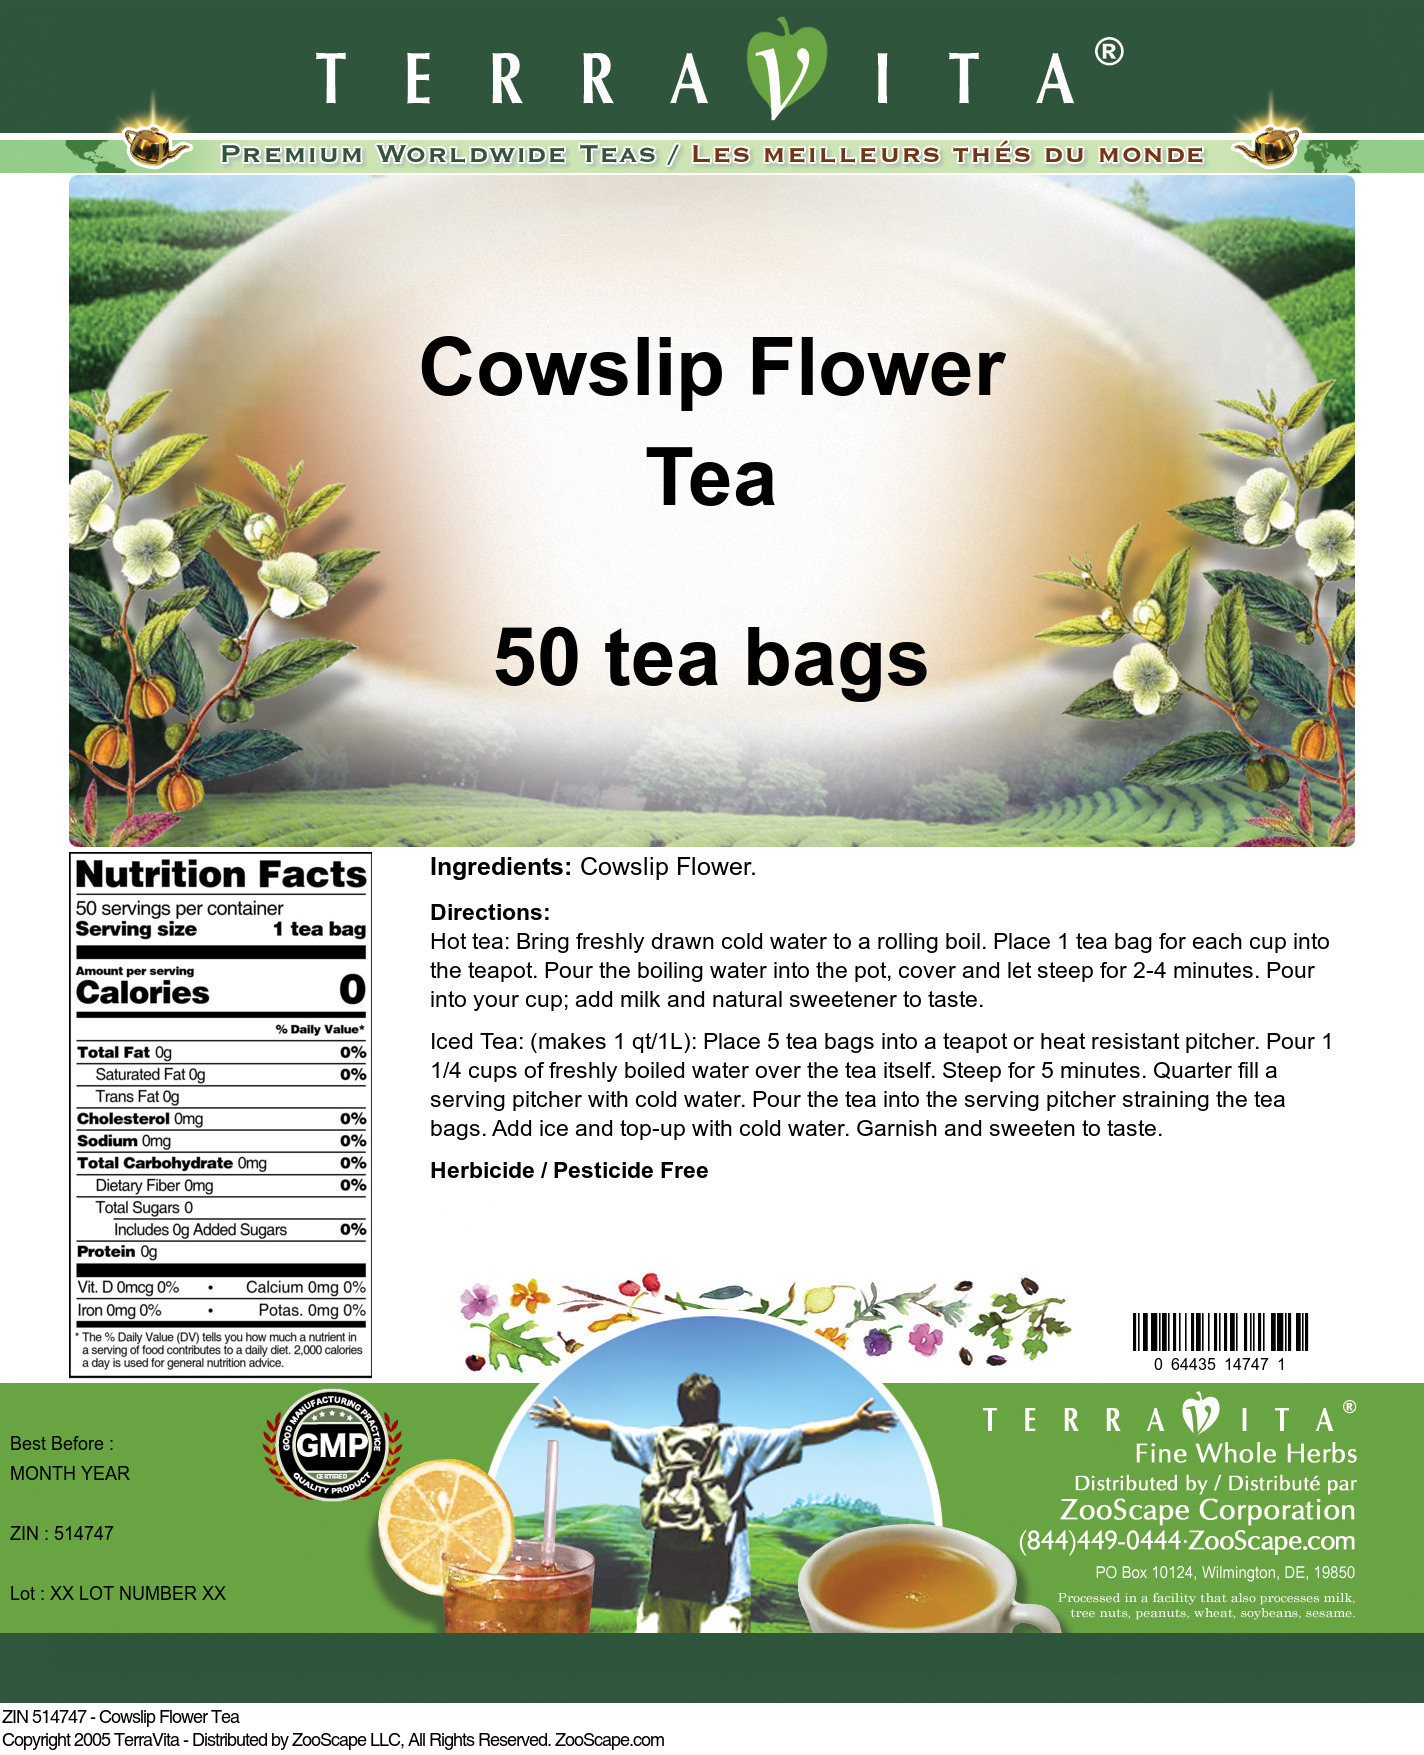 Cowslip Flower